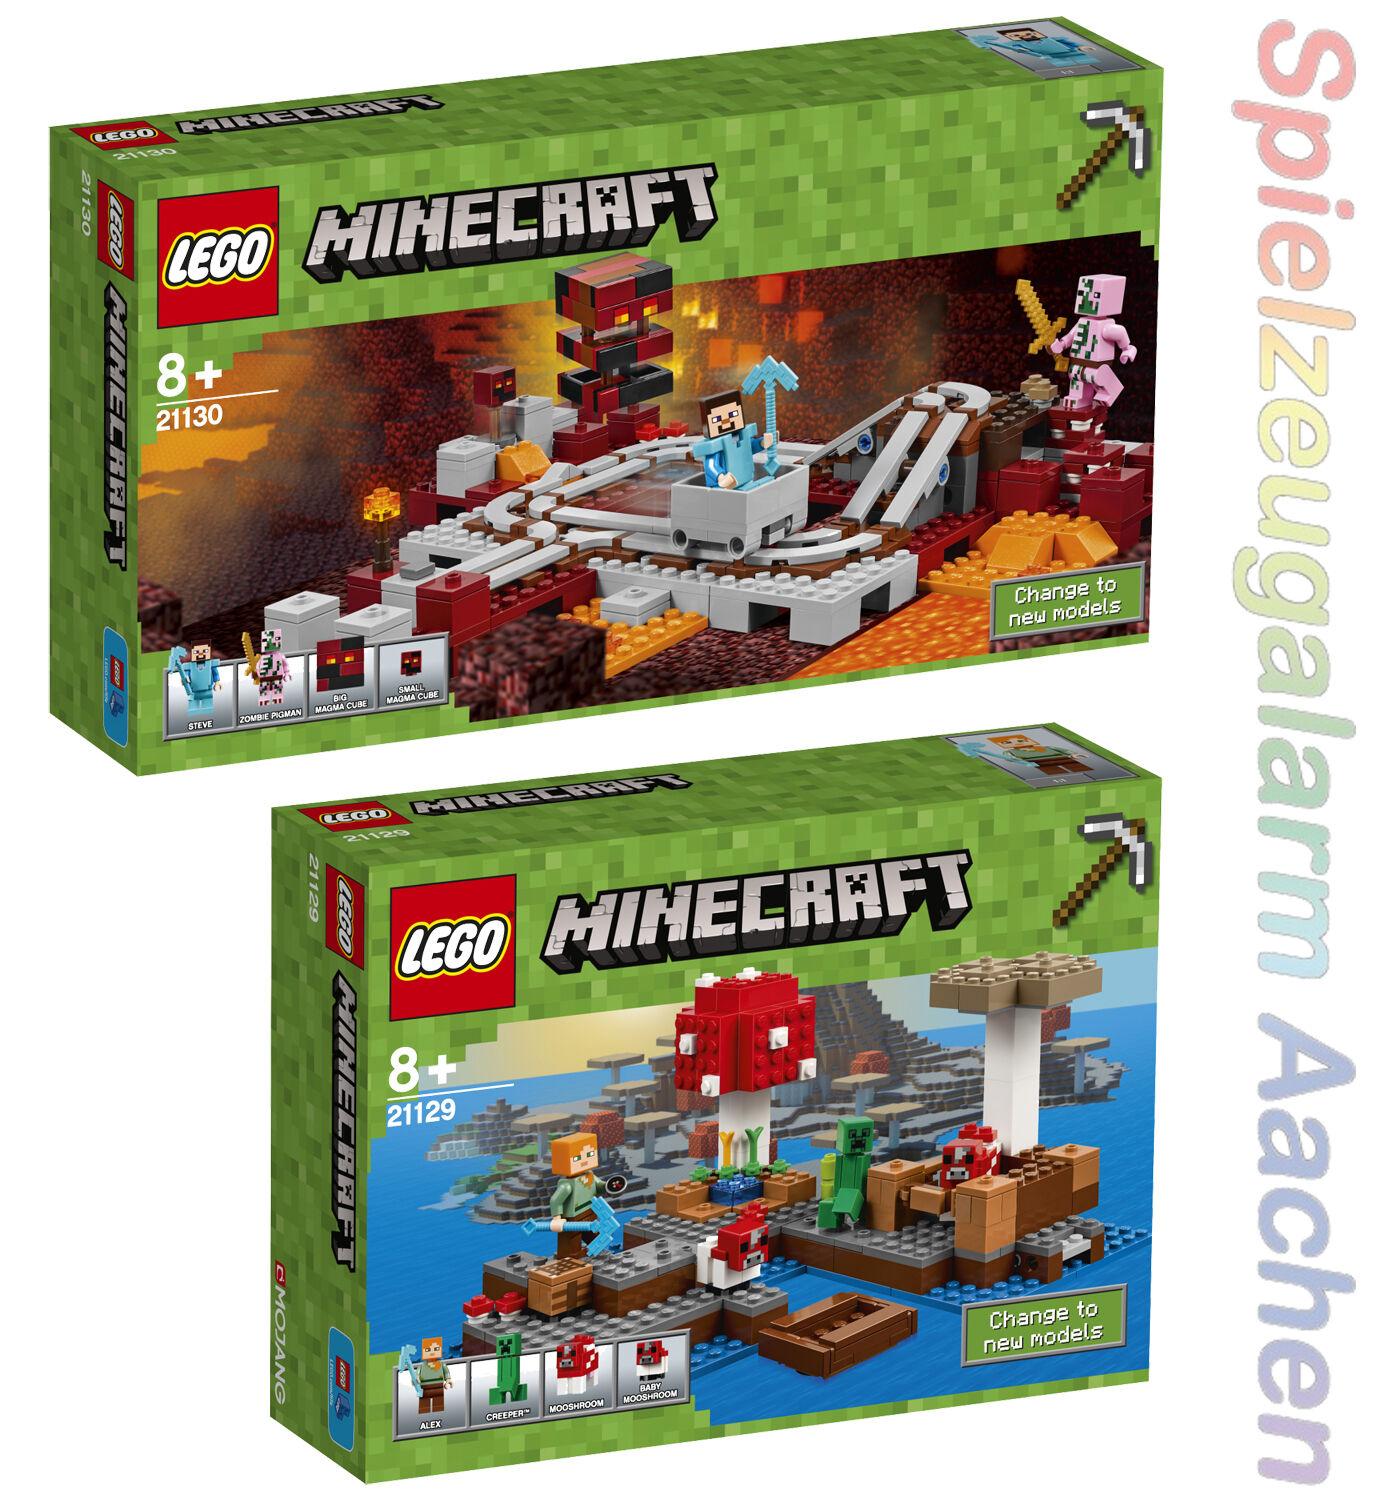 LEGO Minecraft 2tlg set set set 21129 21130 les pilzinsel la nether ferroviaire ale n5/17 10ba1b